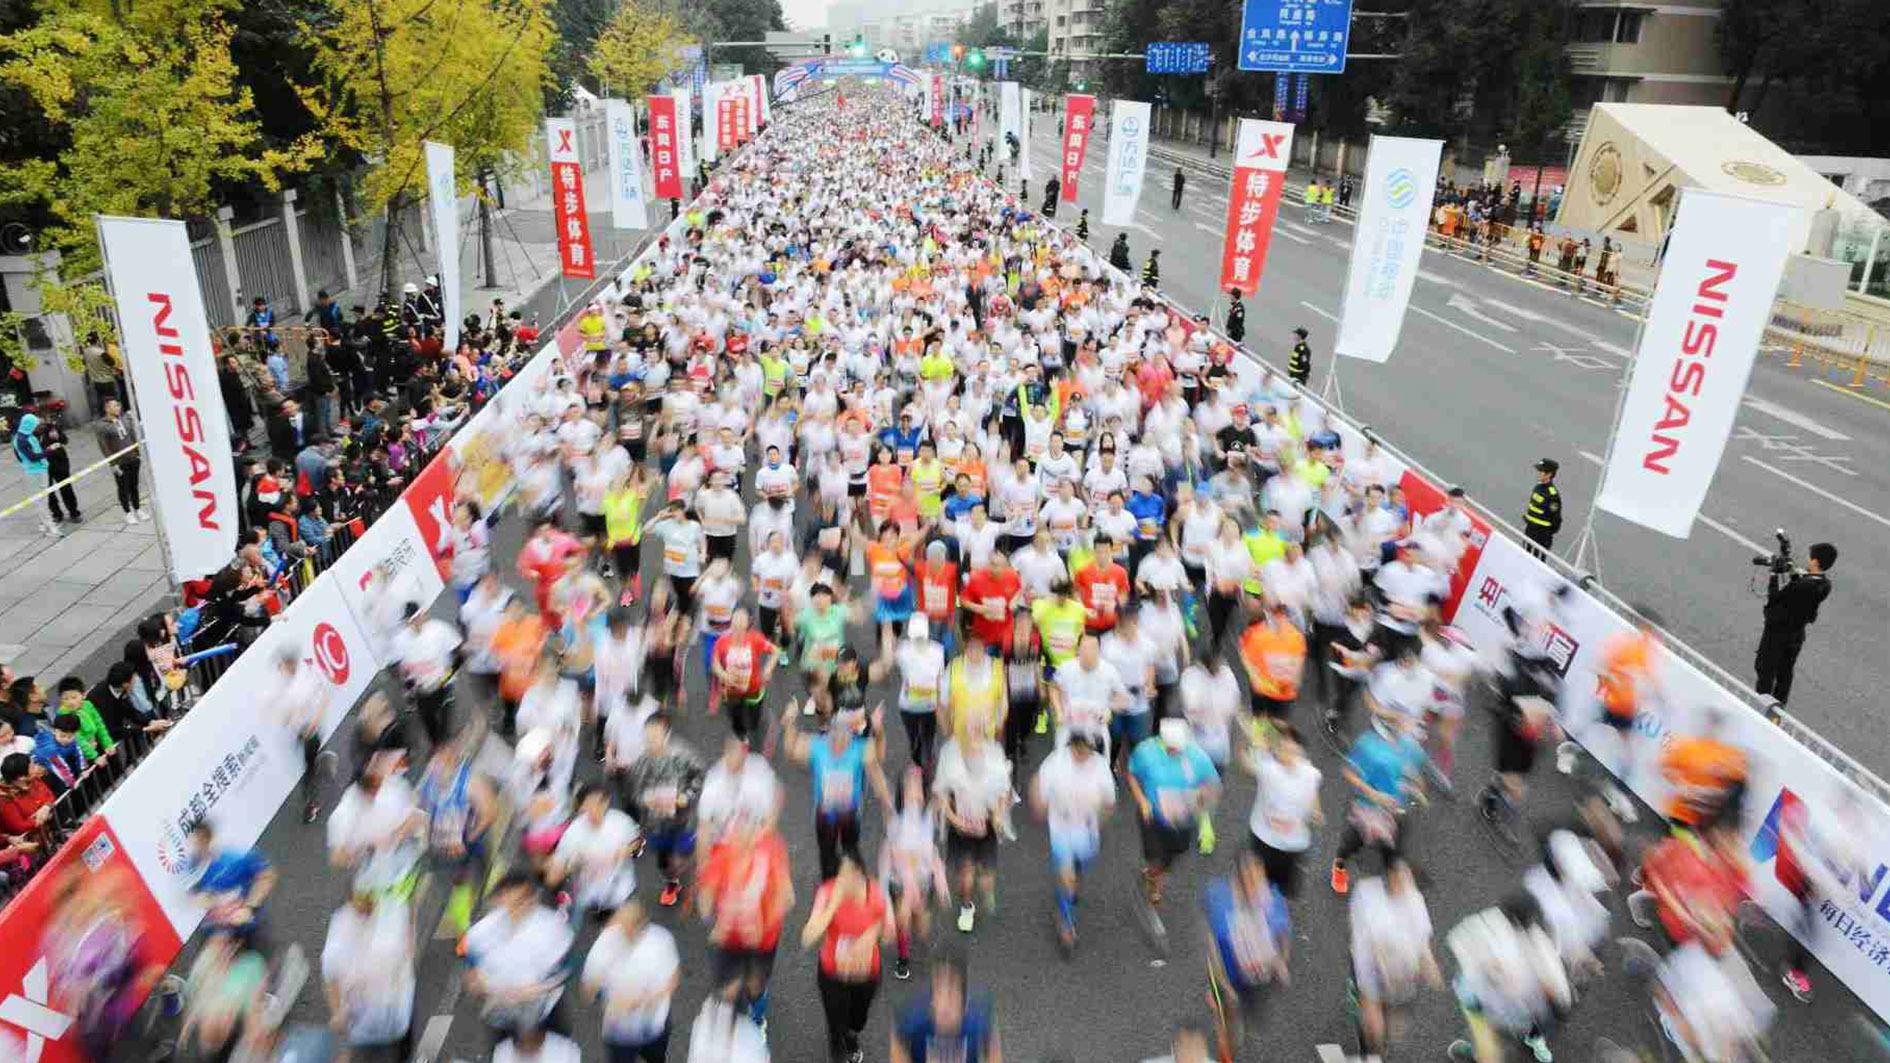 Tokyo Marathon to cancel general public entry